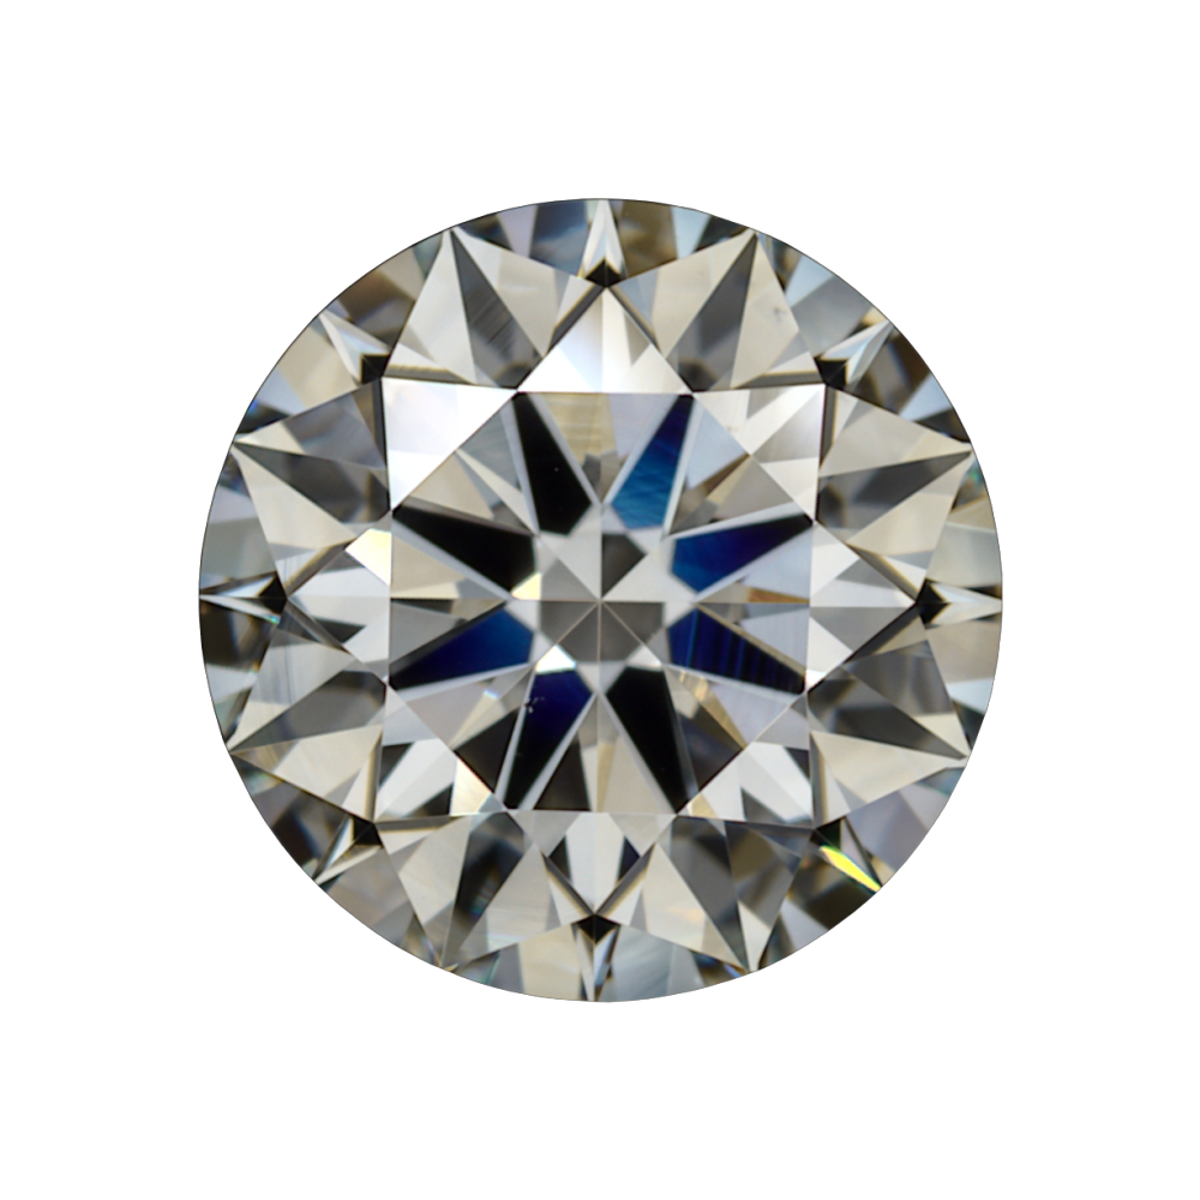 https://cdn.briangavindiamonds.com/files/mp4/BLAGS-104108734015/BLAGS-104108734015-Office-02.mp4